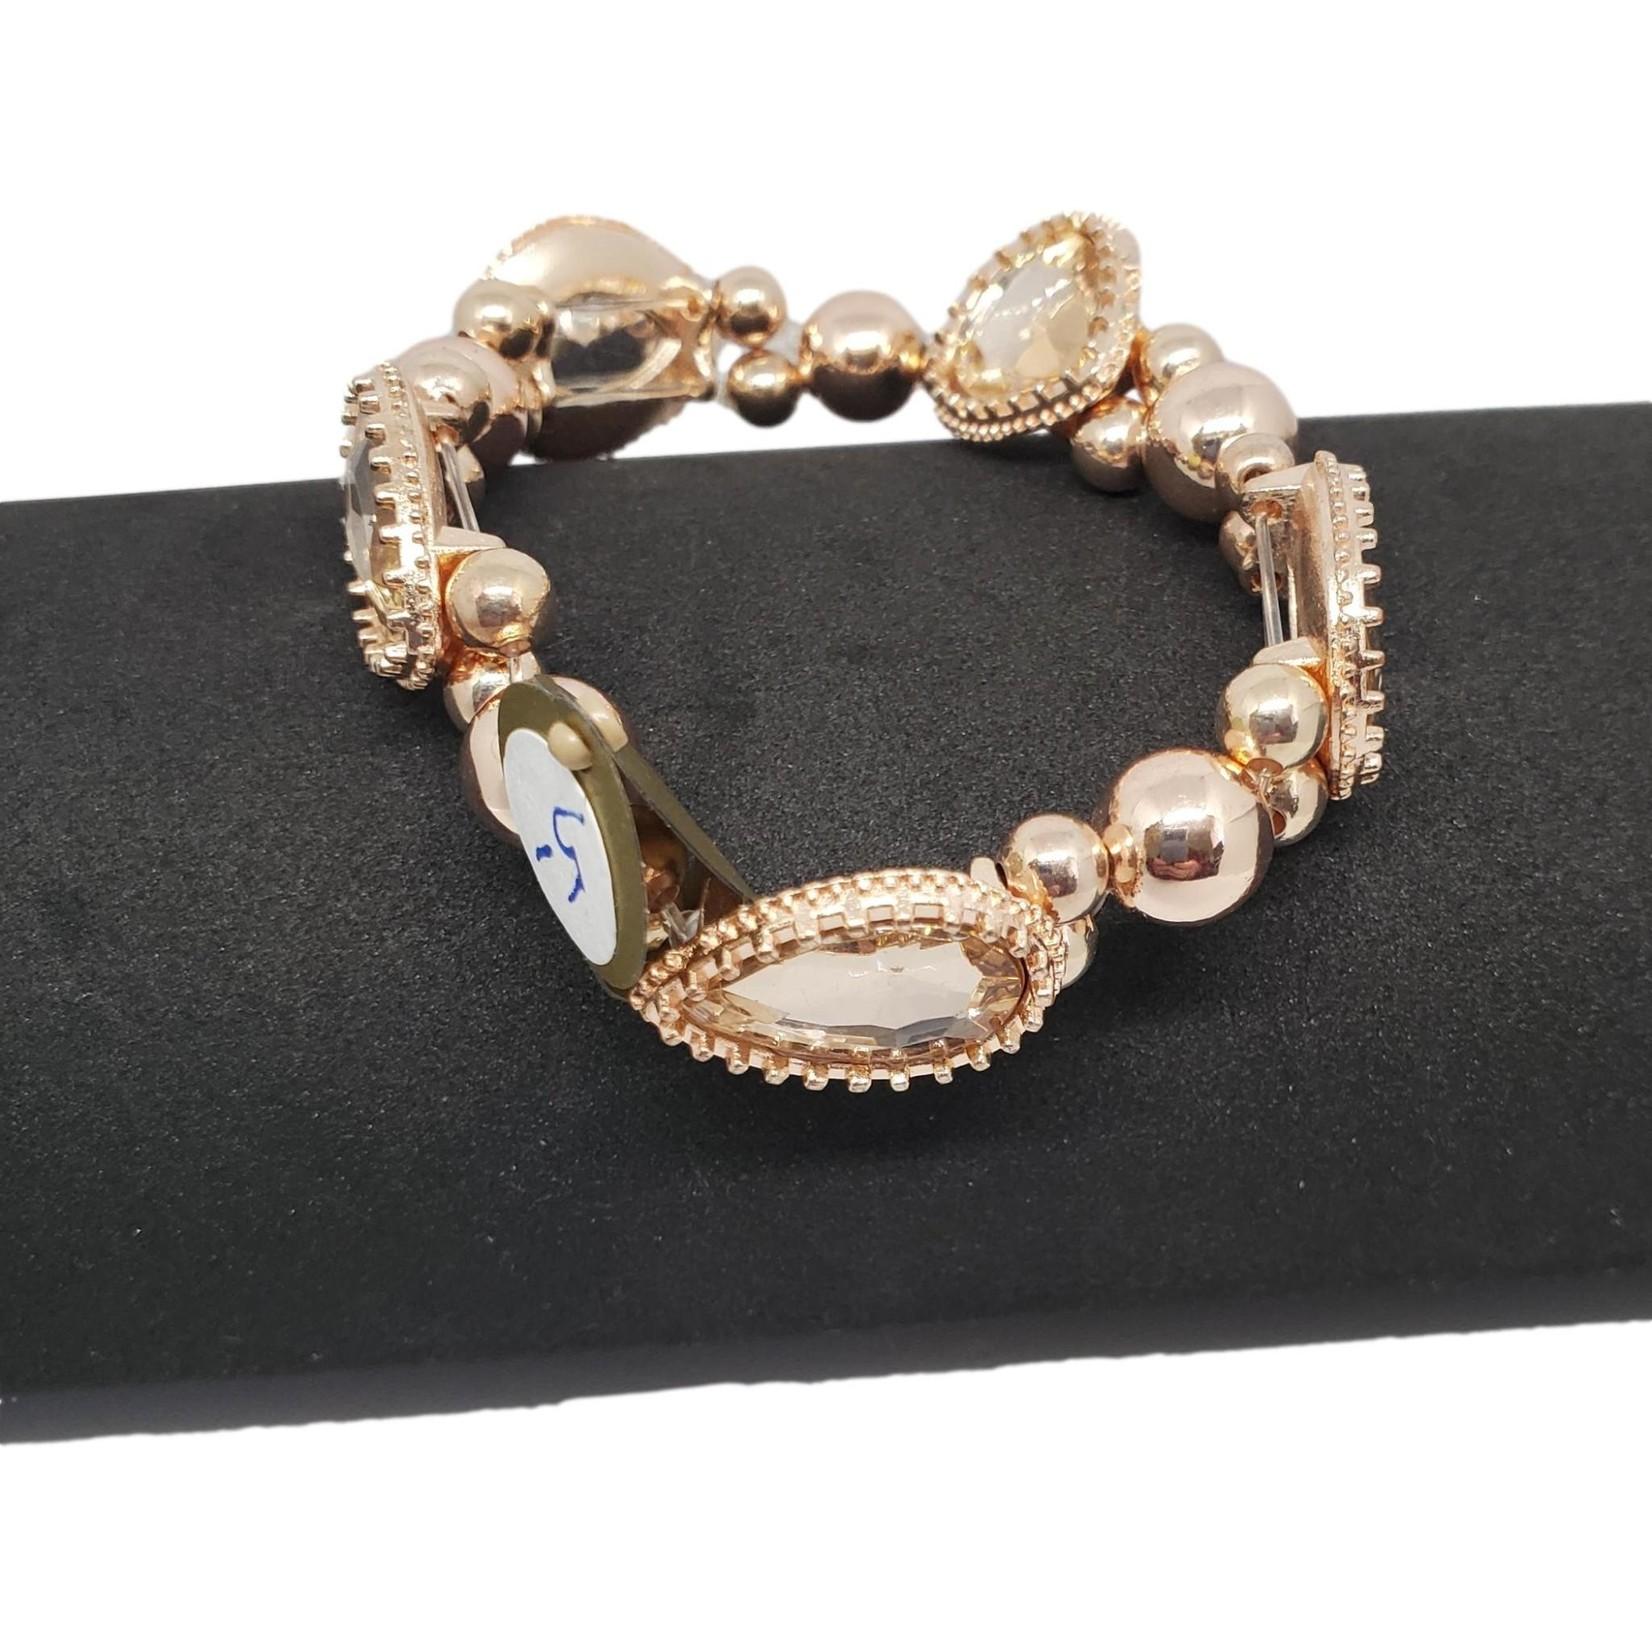 Jewellery by Deborah Young-Groves Rose-Gold Coloured Teardrop Beaded Bracelet